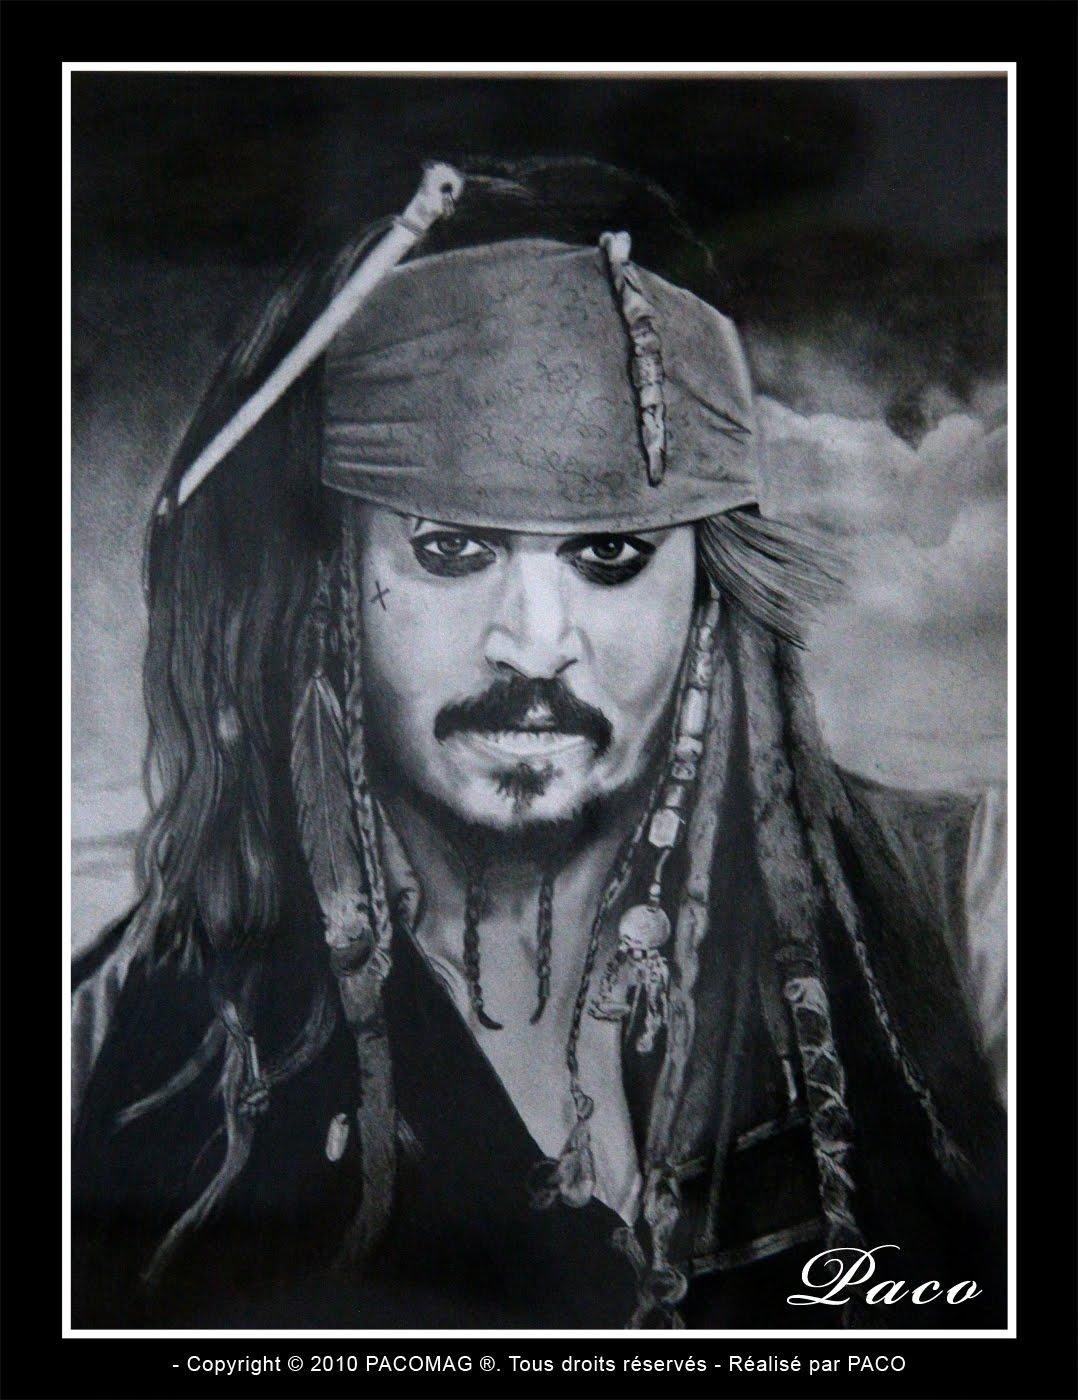 http://2.bp.blogspot.com/-D4aEZt2vx2I/T99slMlYkjI/AAAAAAAAA0I/85y8wr3TrFw/s1600/portrait-de-Johnny-Depp-par-paco-illustrateur-graphiste-artiste-peintre.jpg